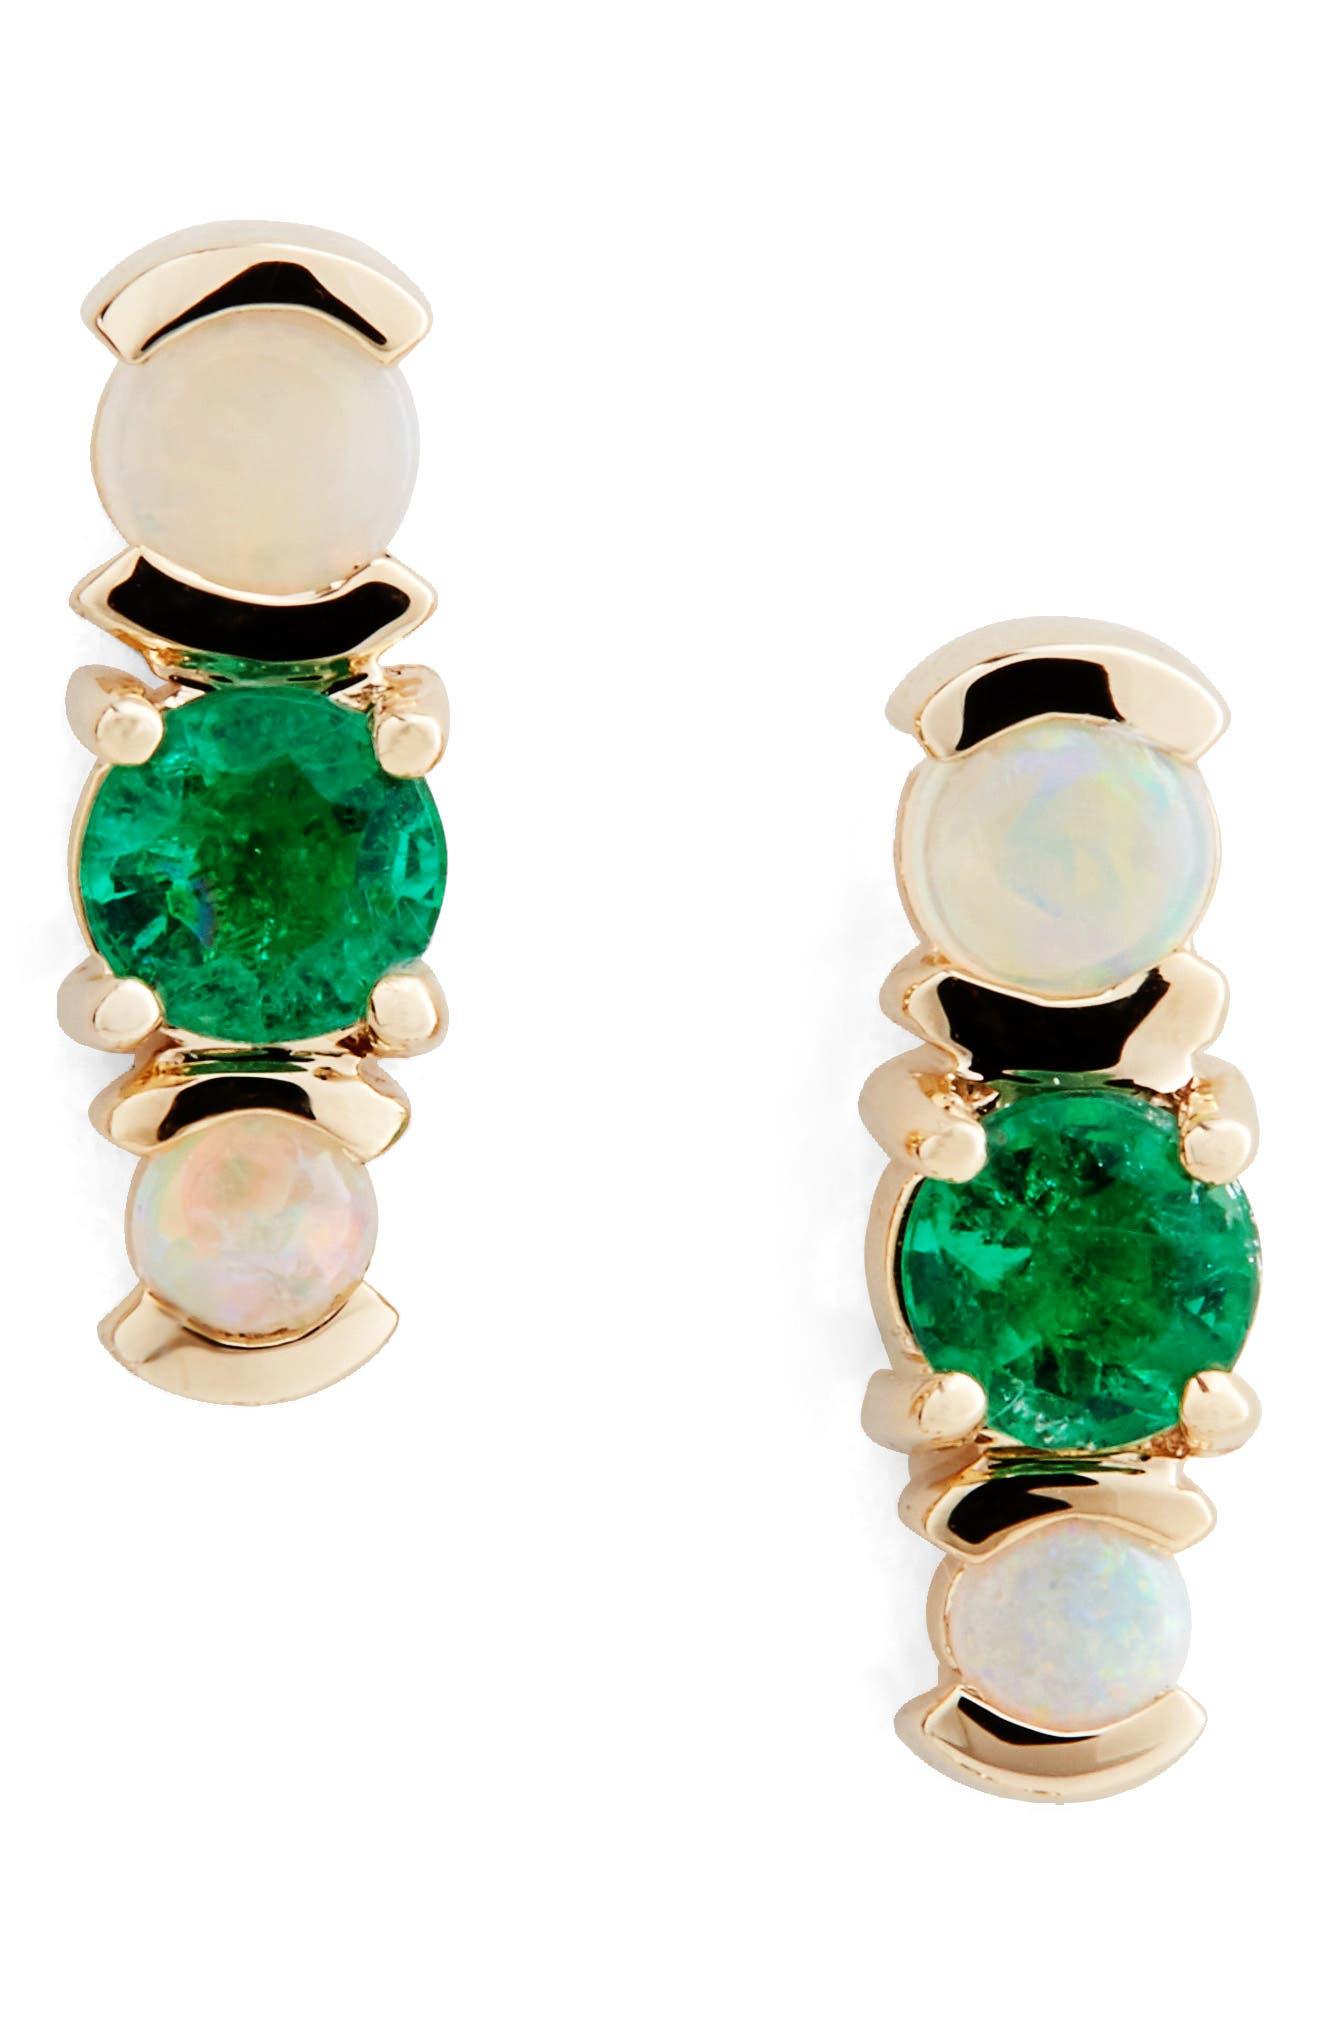 Emerald & Opal Cluster Earrings,                             Main thumbnail 1, color,                             340